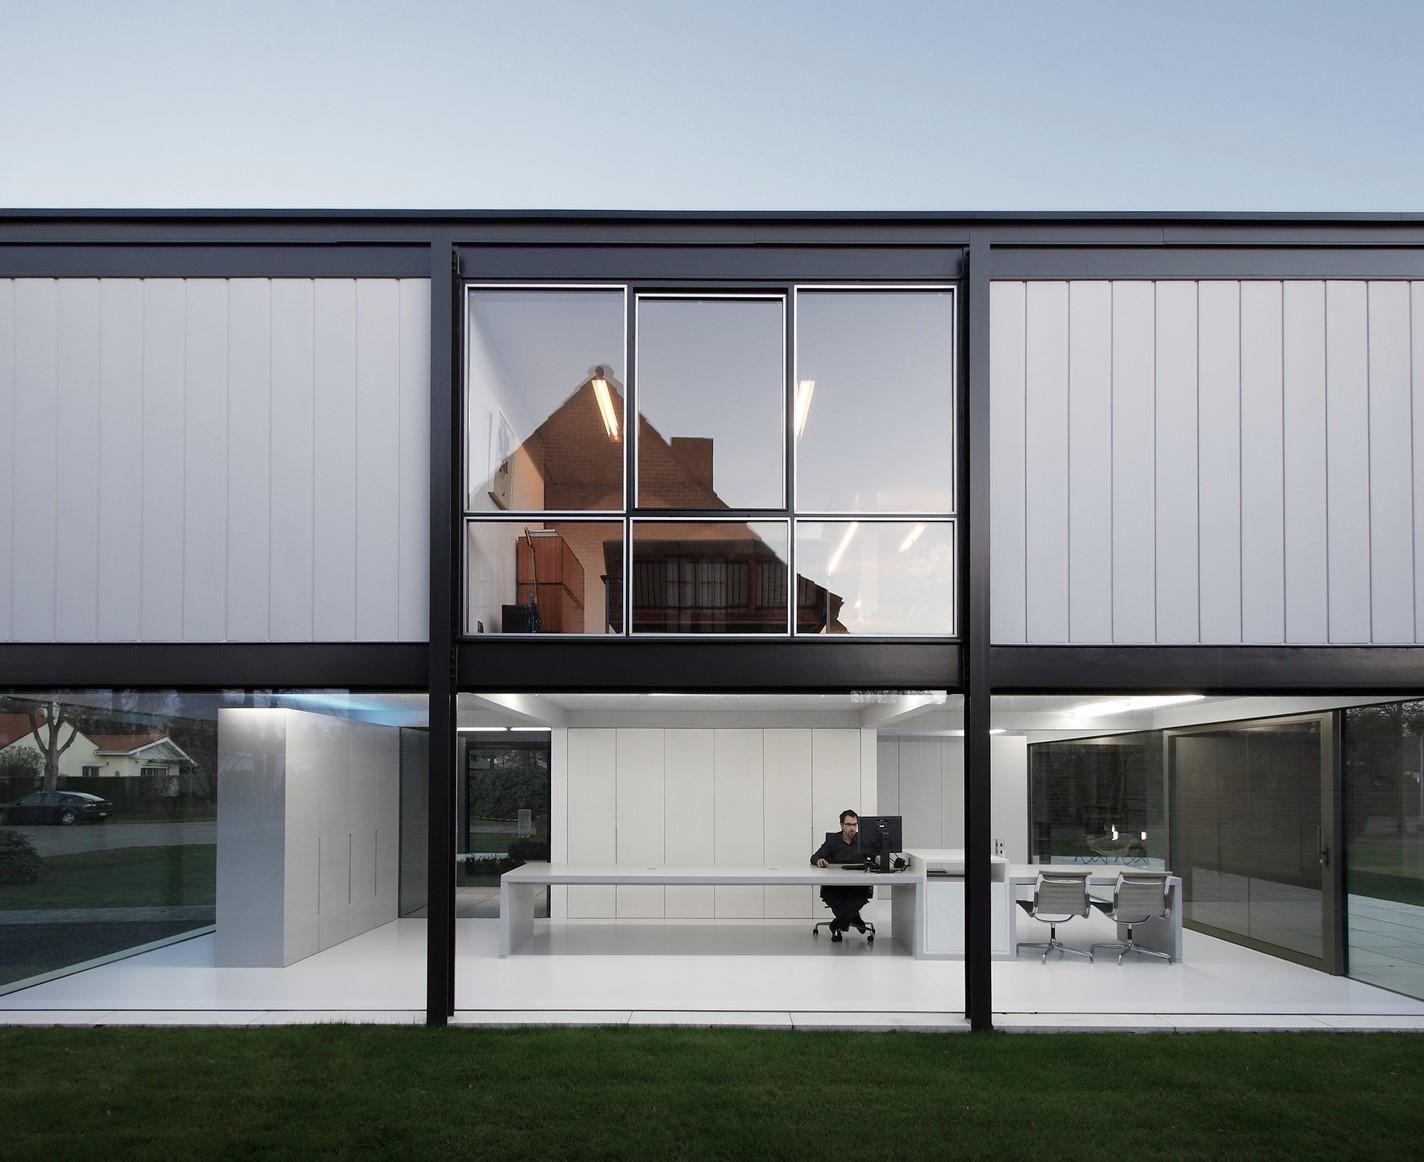 Zoersel House by Arjaan De Feyter Design Zine